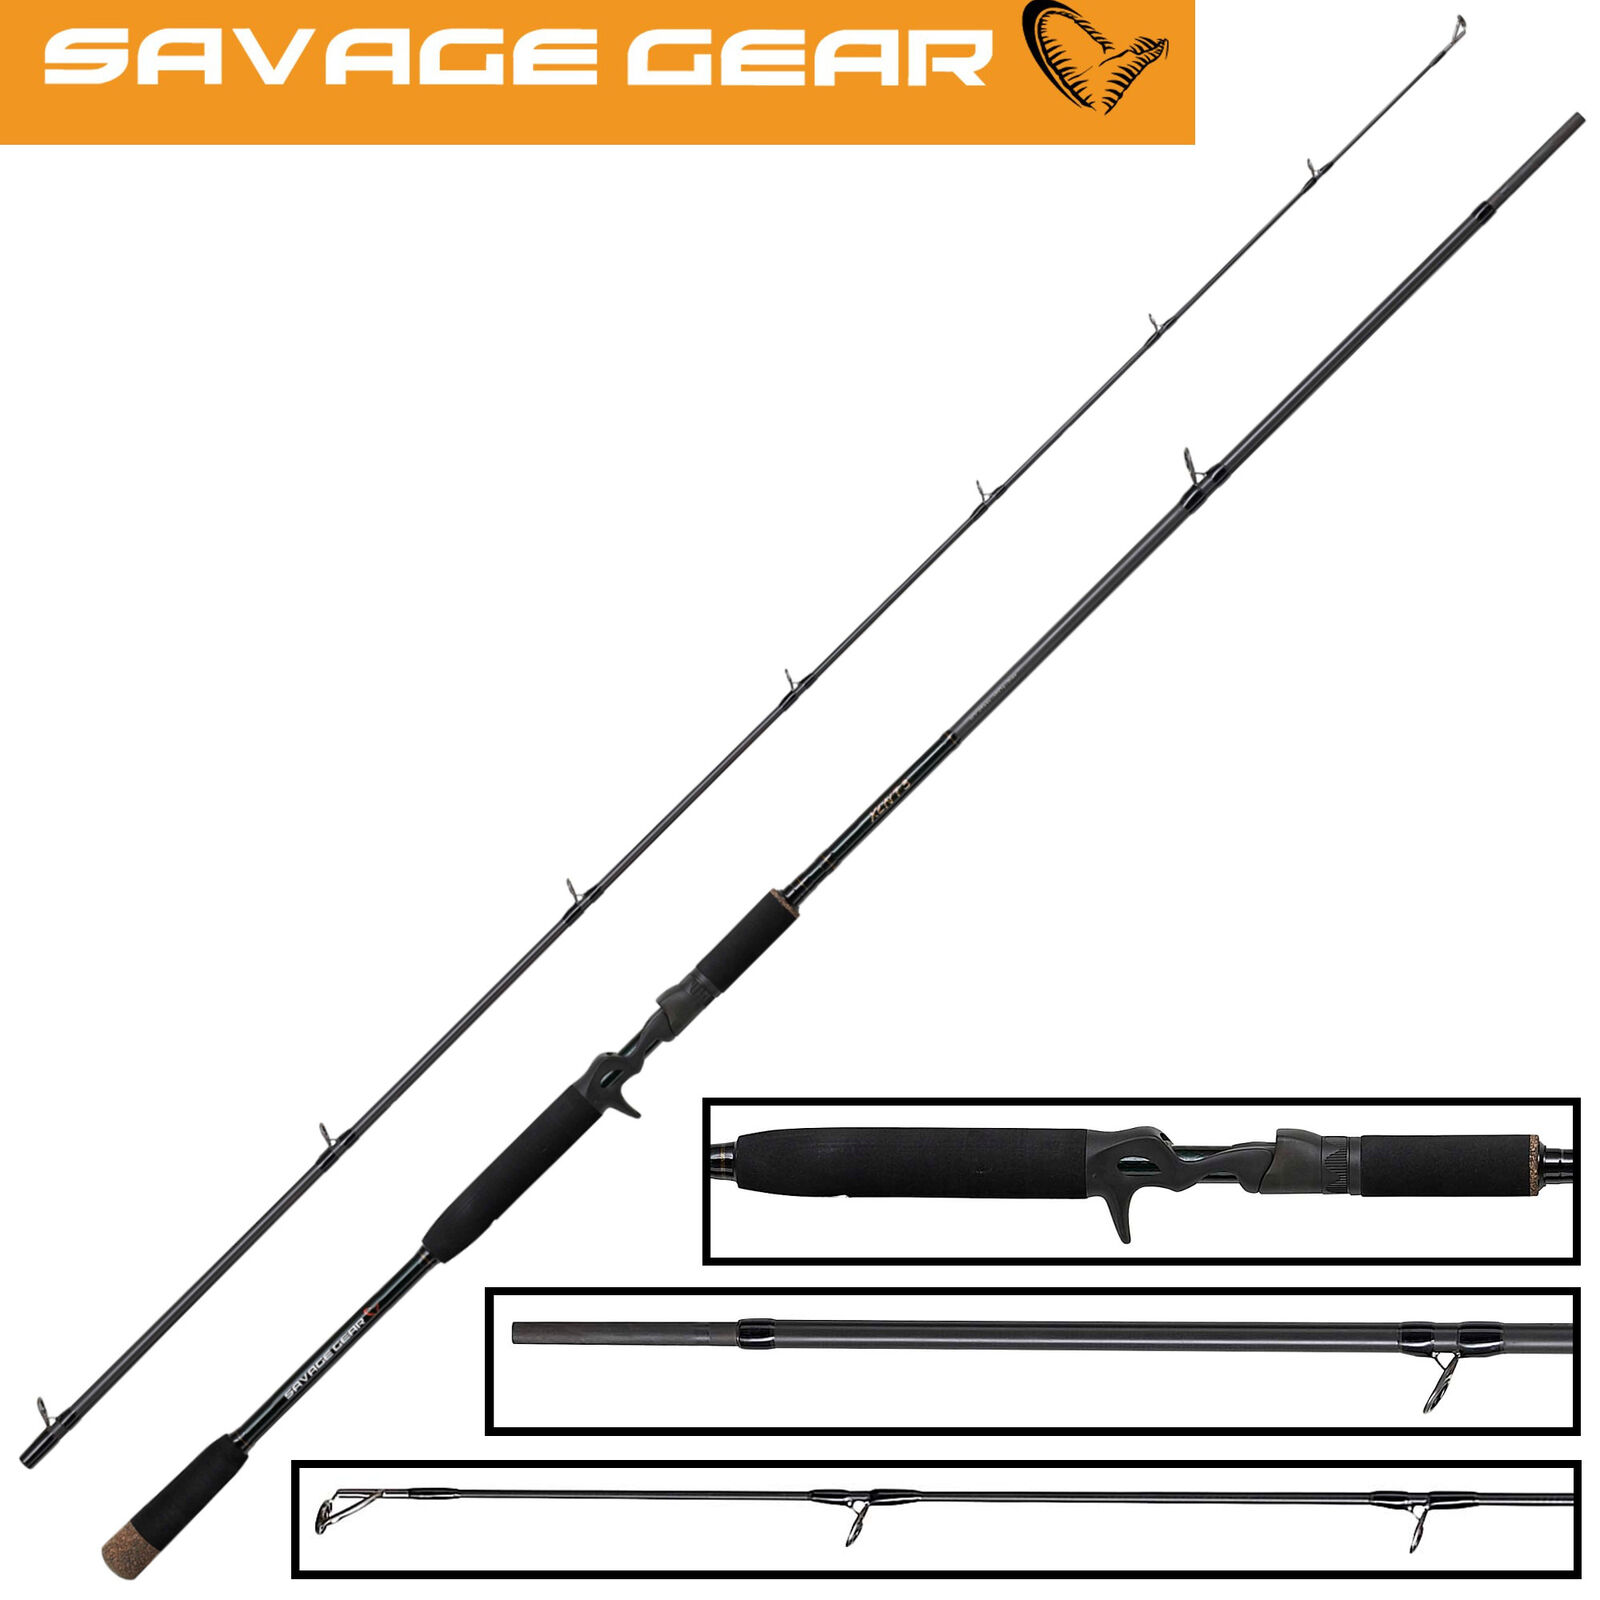 Savage Gear XLNT 3 Spinnrute 2,51m 150g - Hechtrute für Kunstköder, Spinnrute